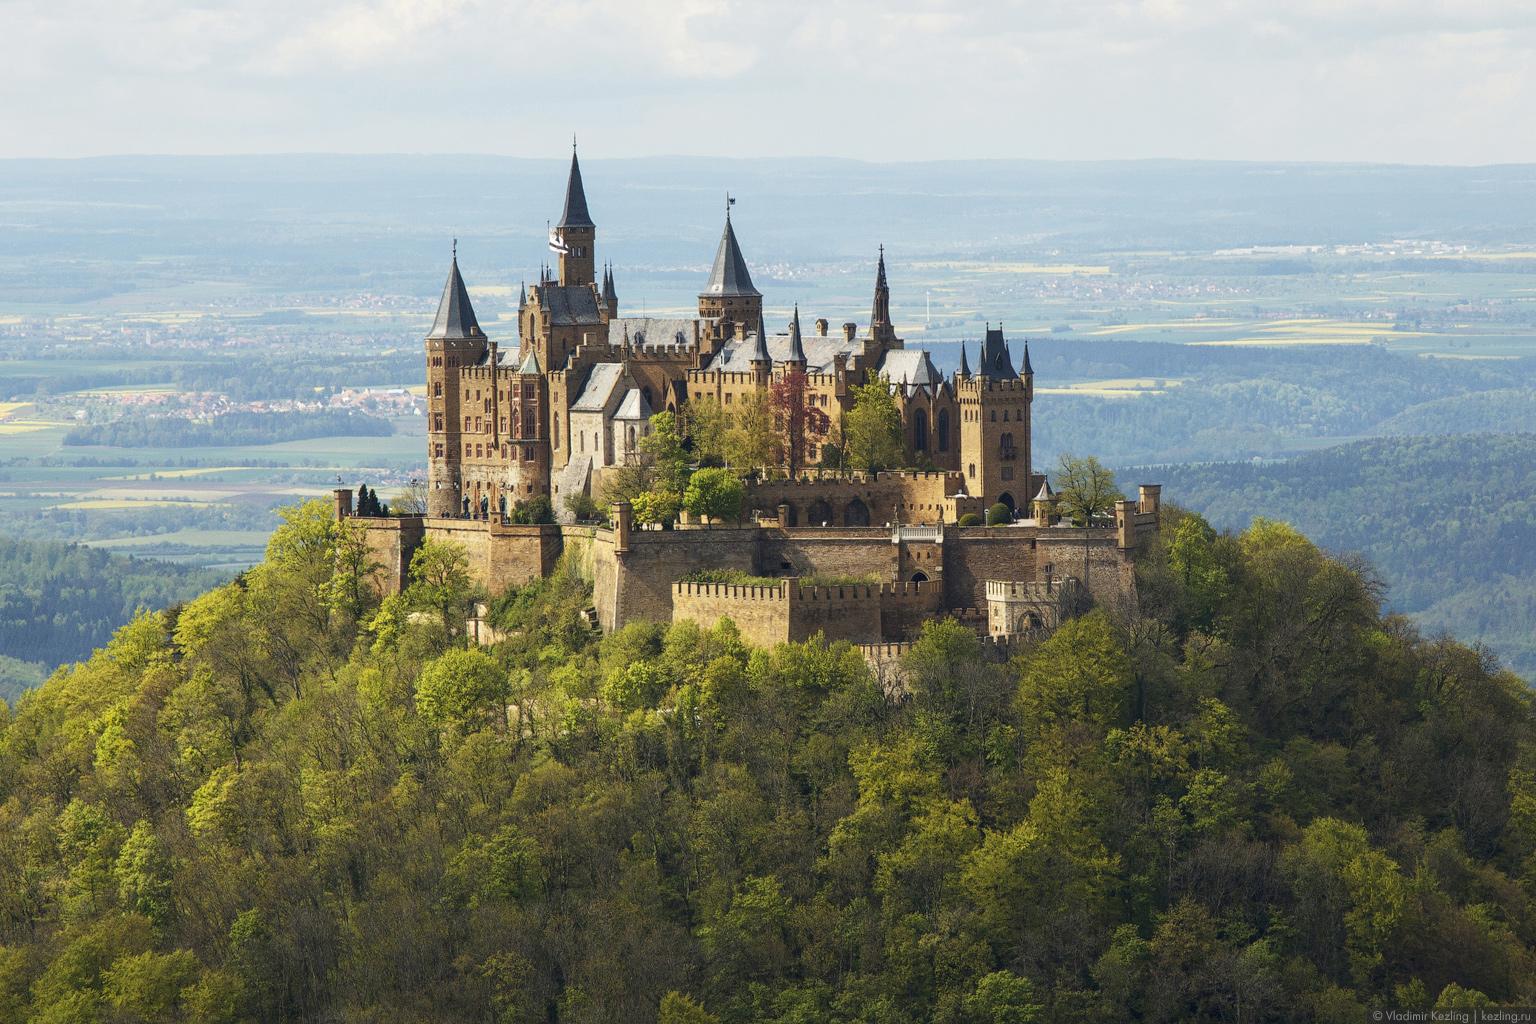 В краю замков и сказок. Гогенцоллерн и Зигмаринген — cказочные замки прусских королей